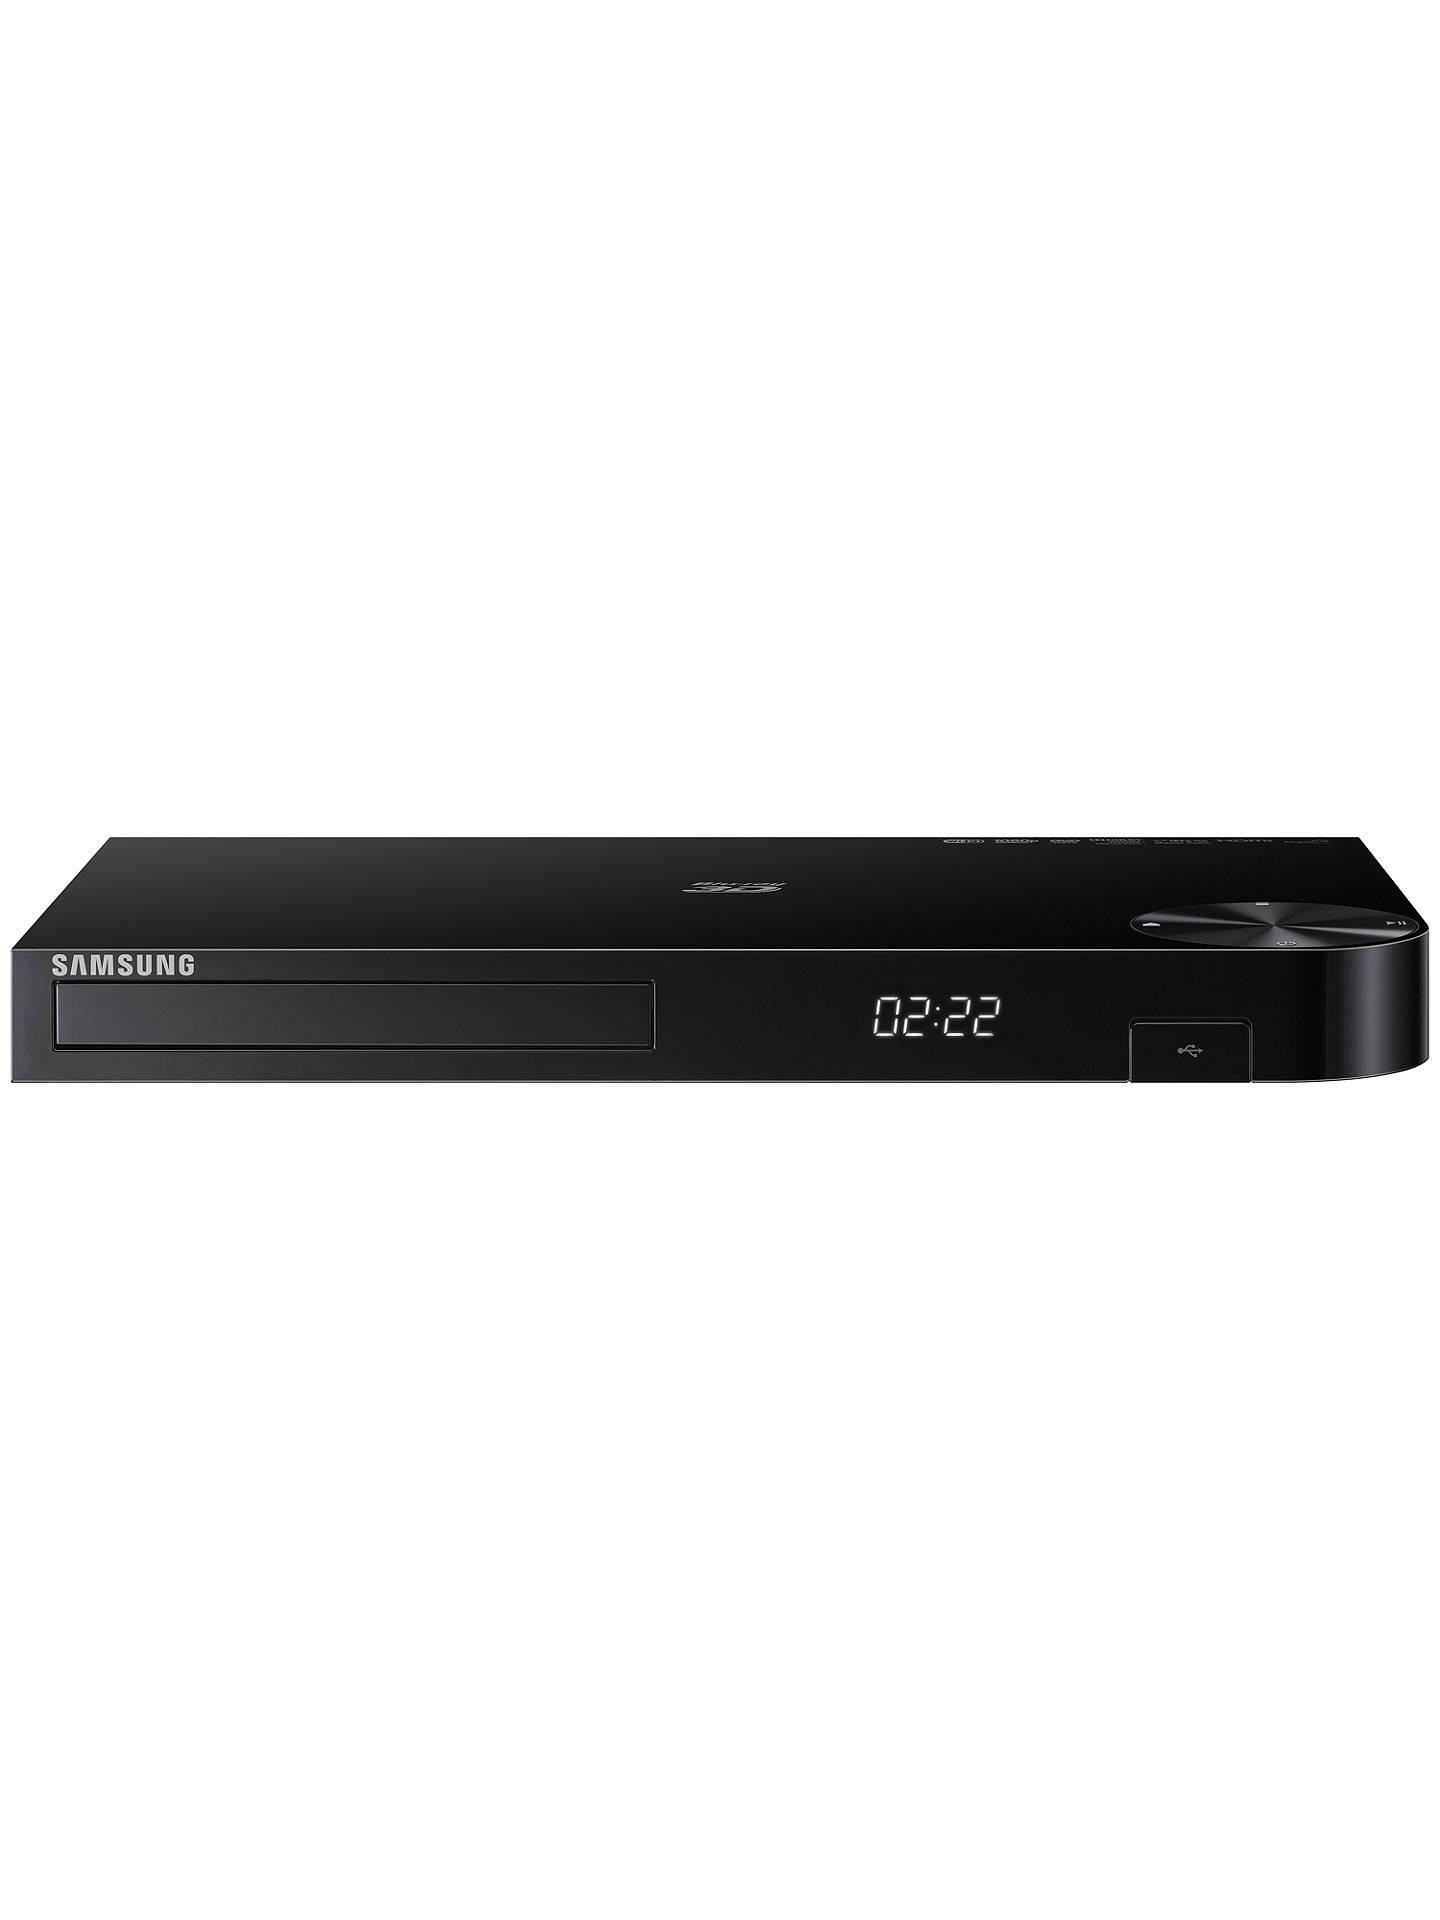 samsung bd h6500 3d smart blu ray disc player manual